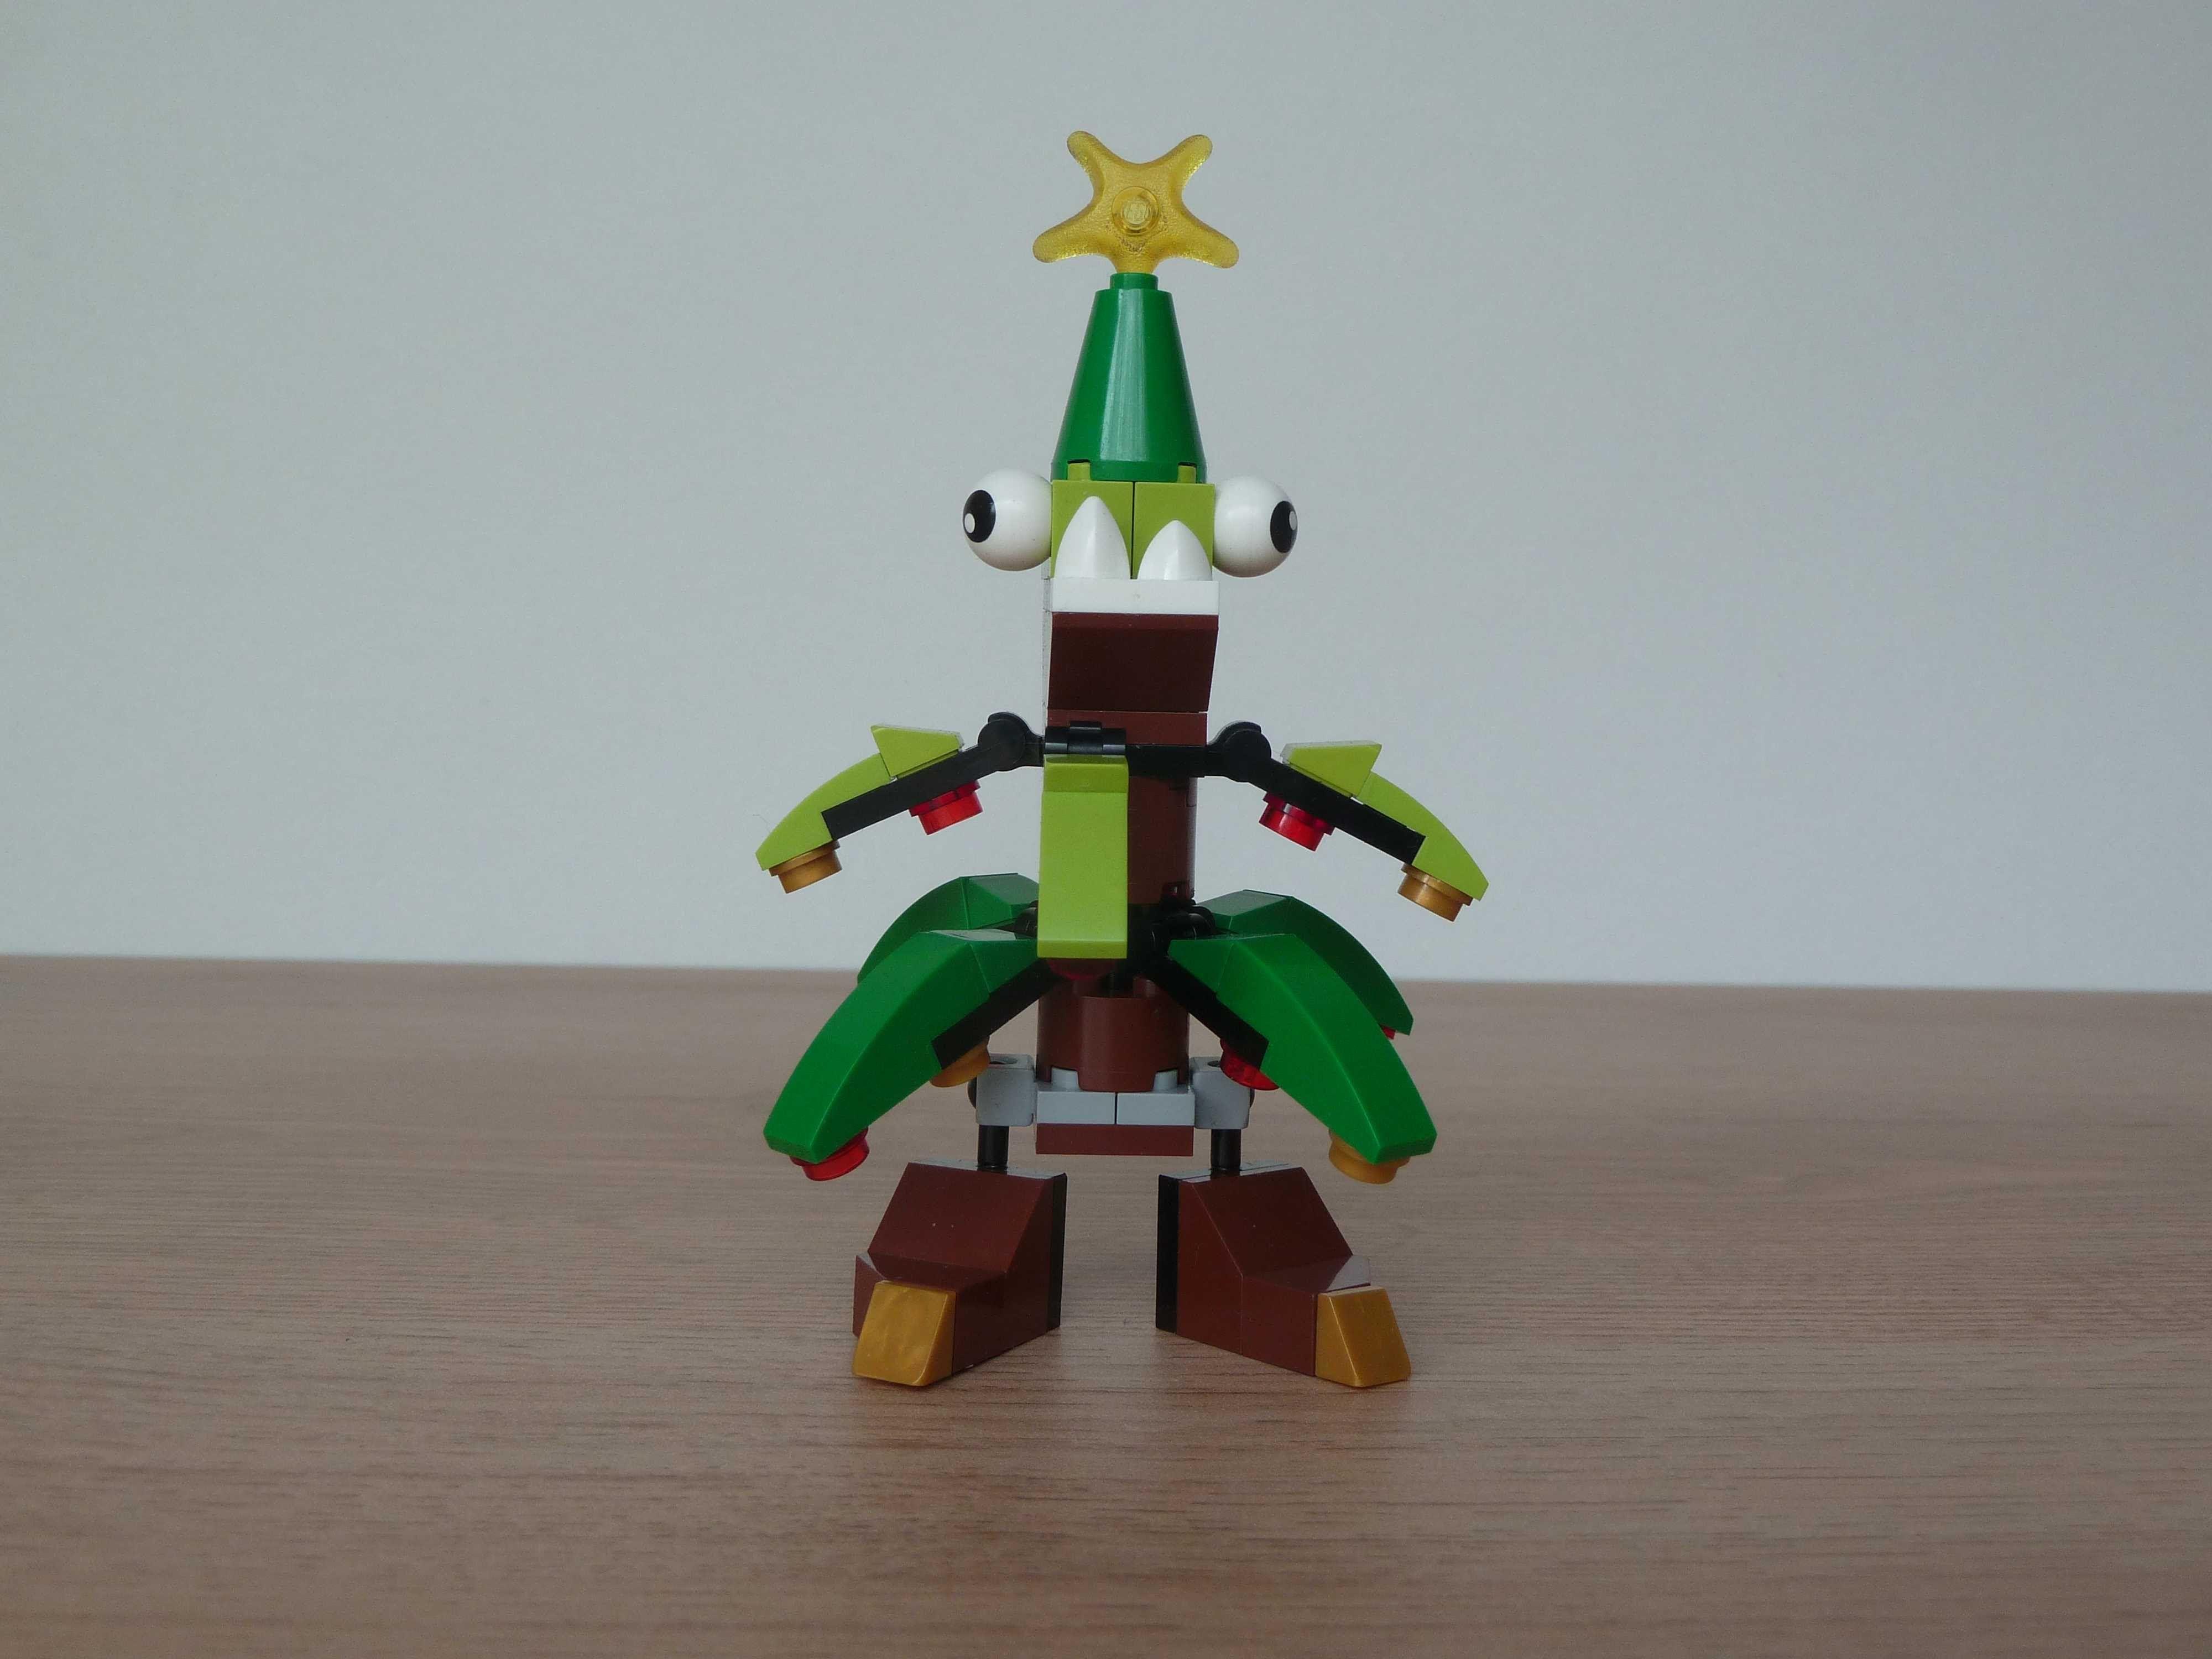 Lego mixels totobricks creations lego pinterest lego and